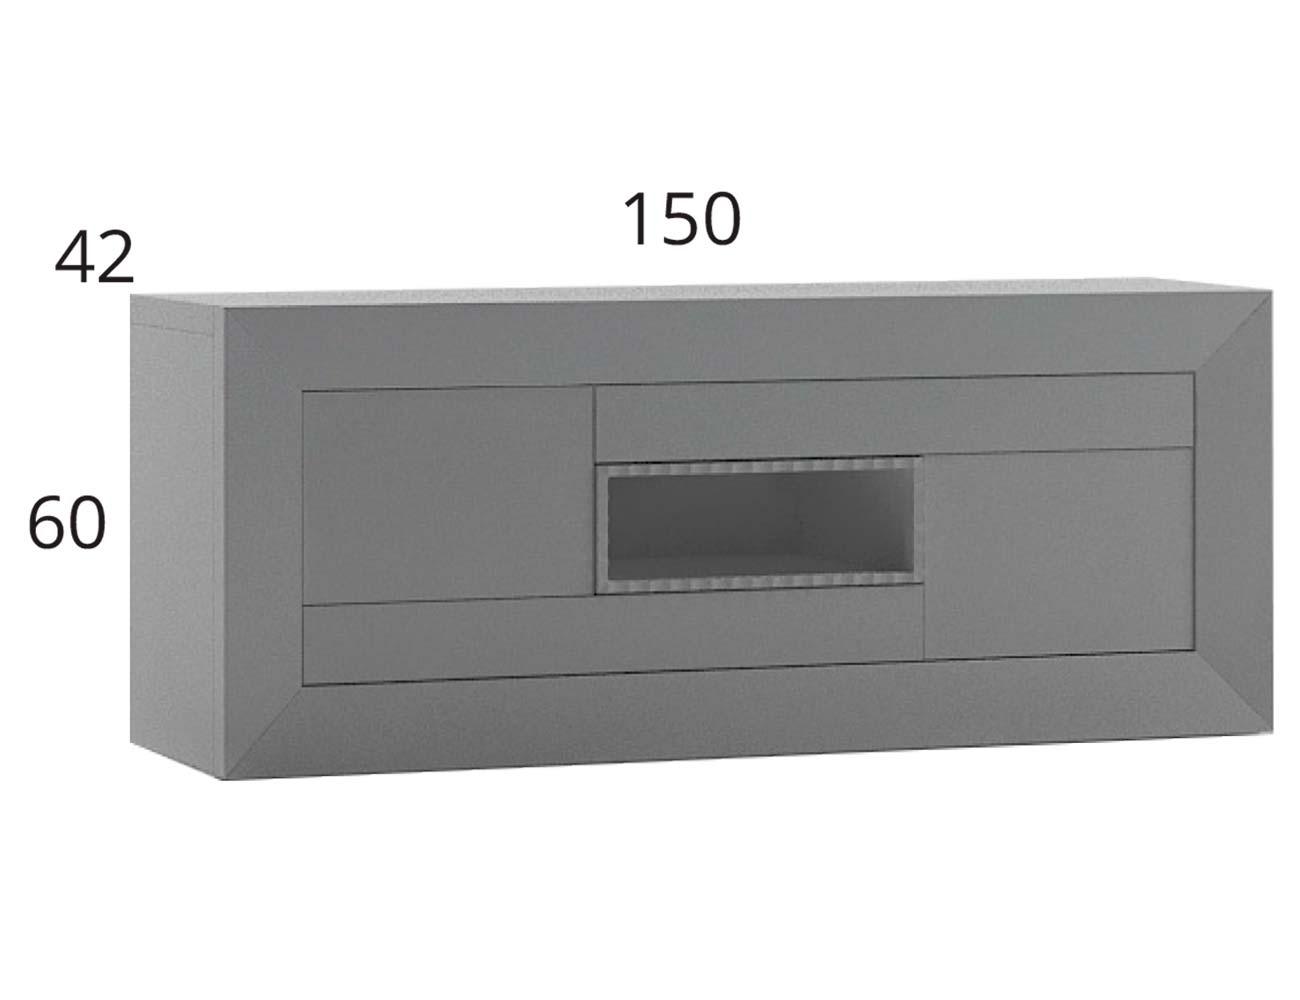 A0701